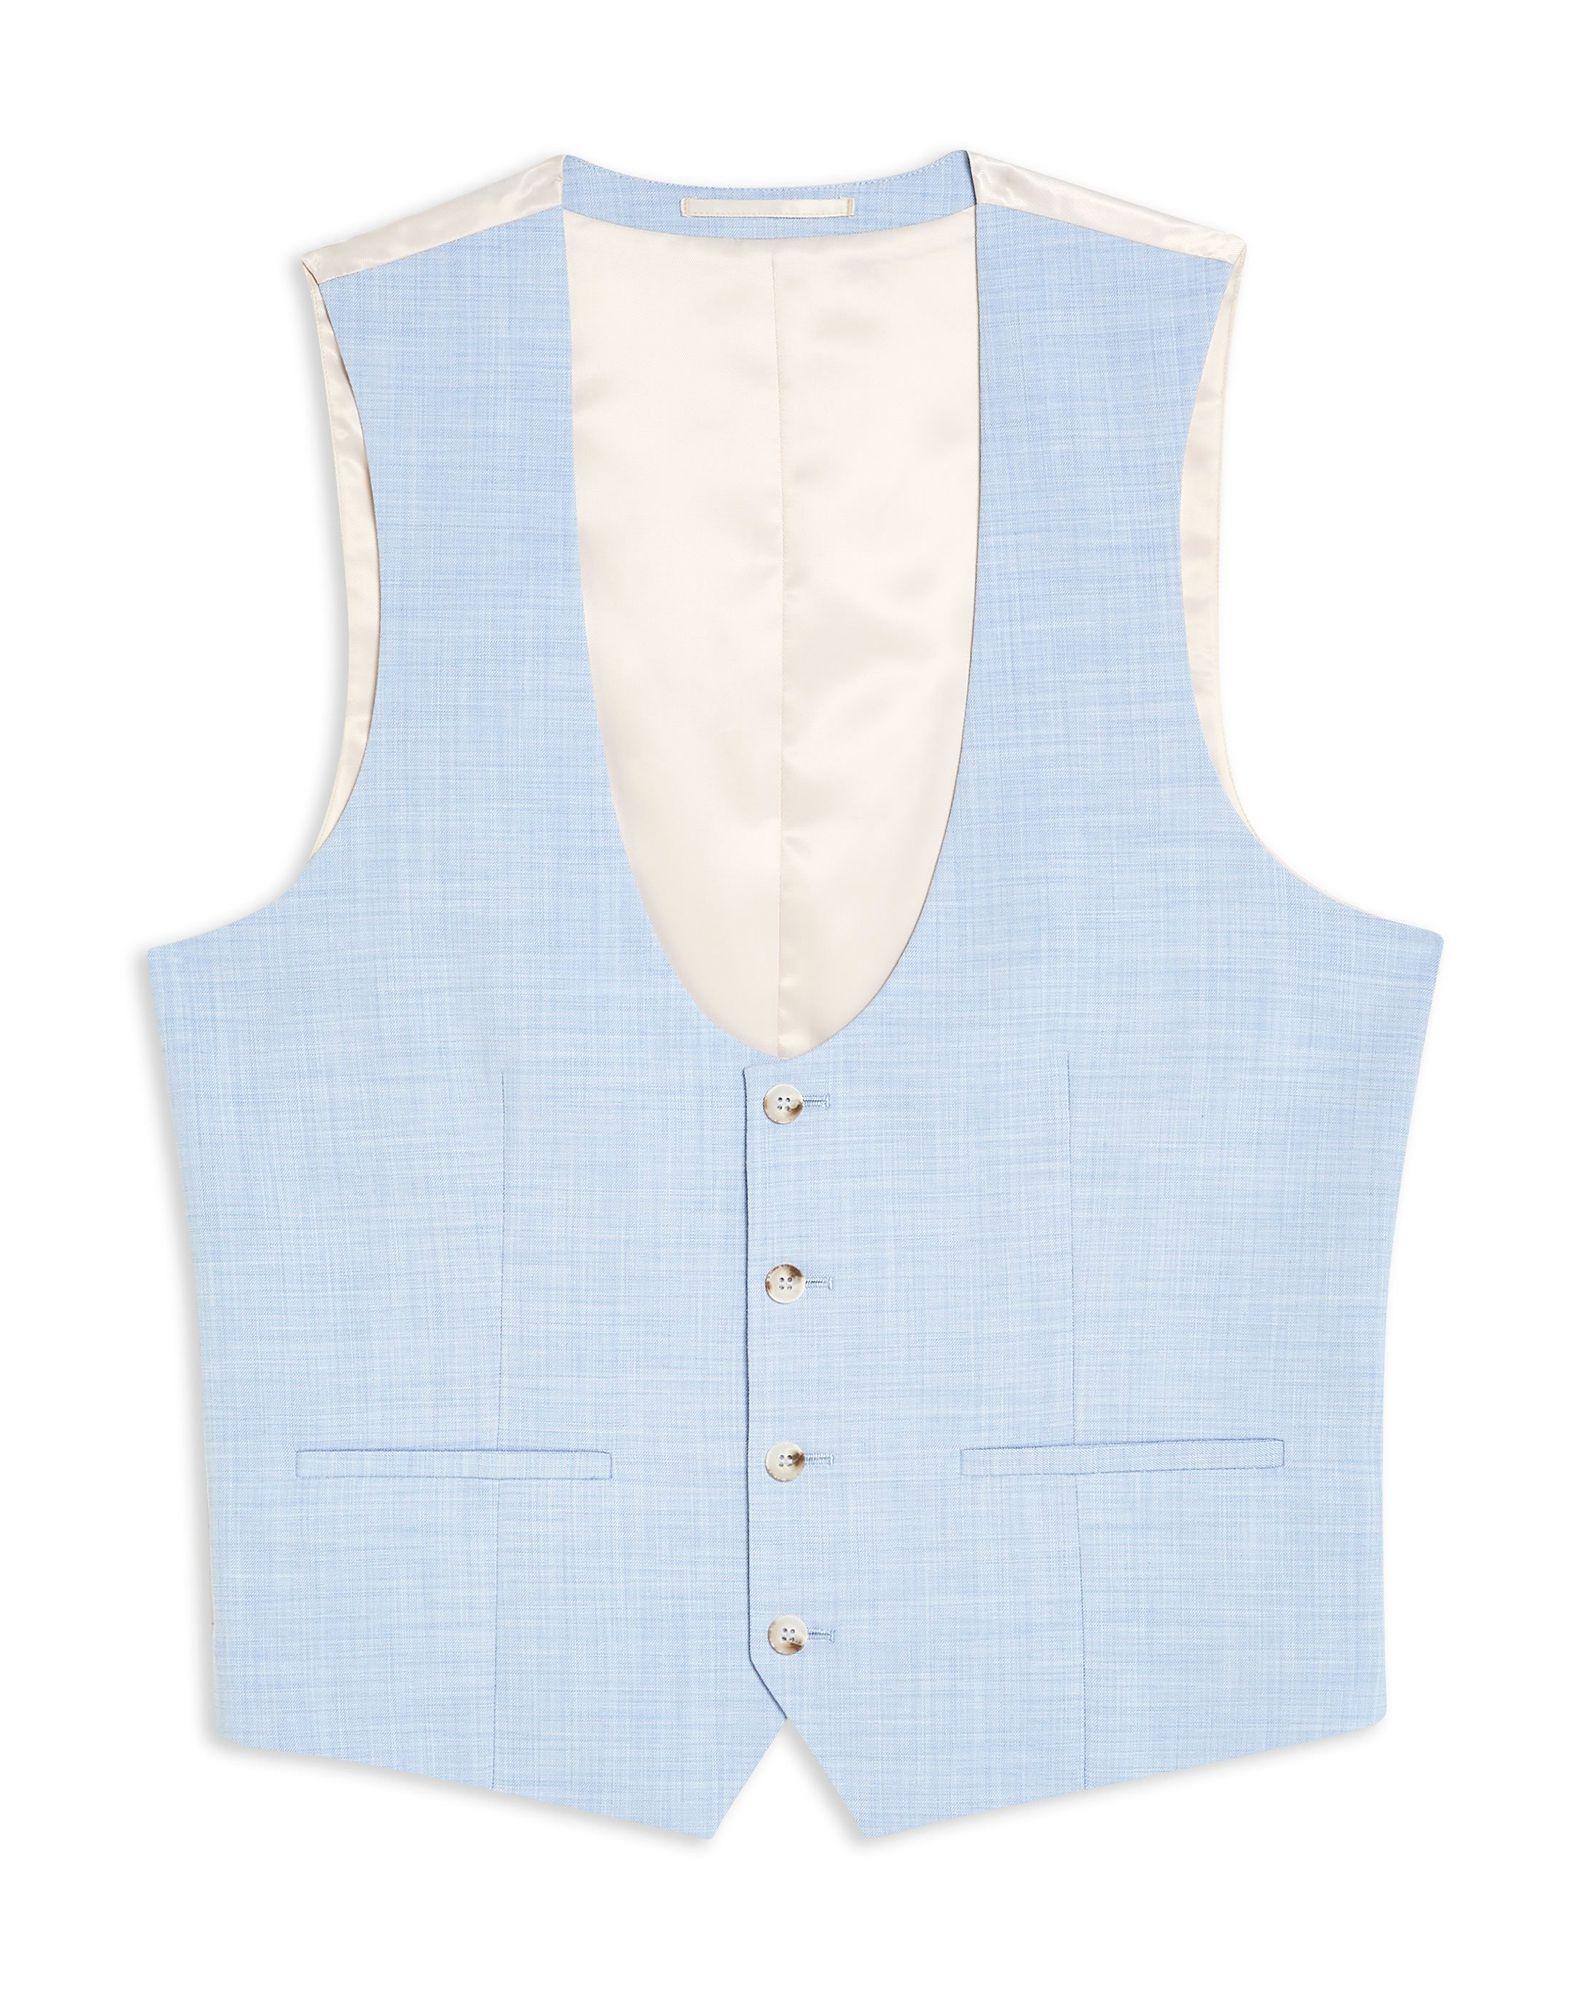 Panciotto Topman blu blu Waistcoat - uomo - 49493730QT  Sonderangebot